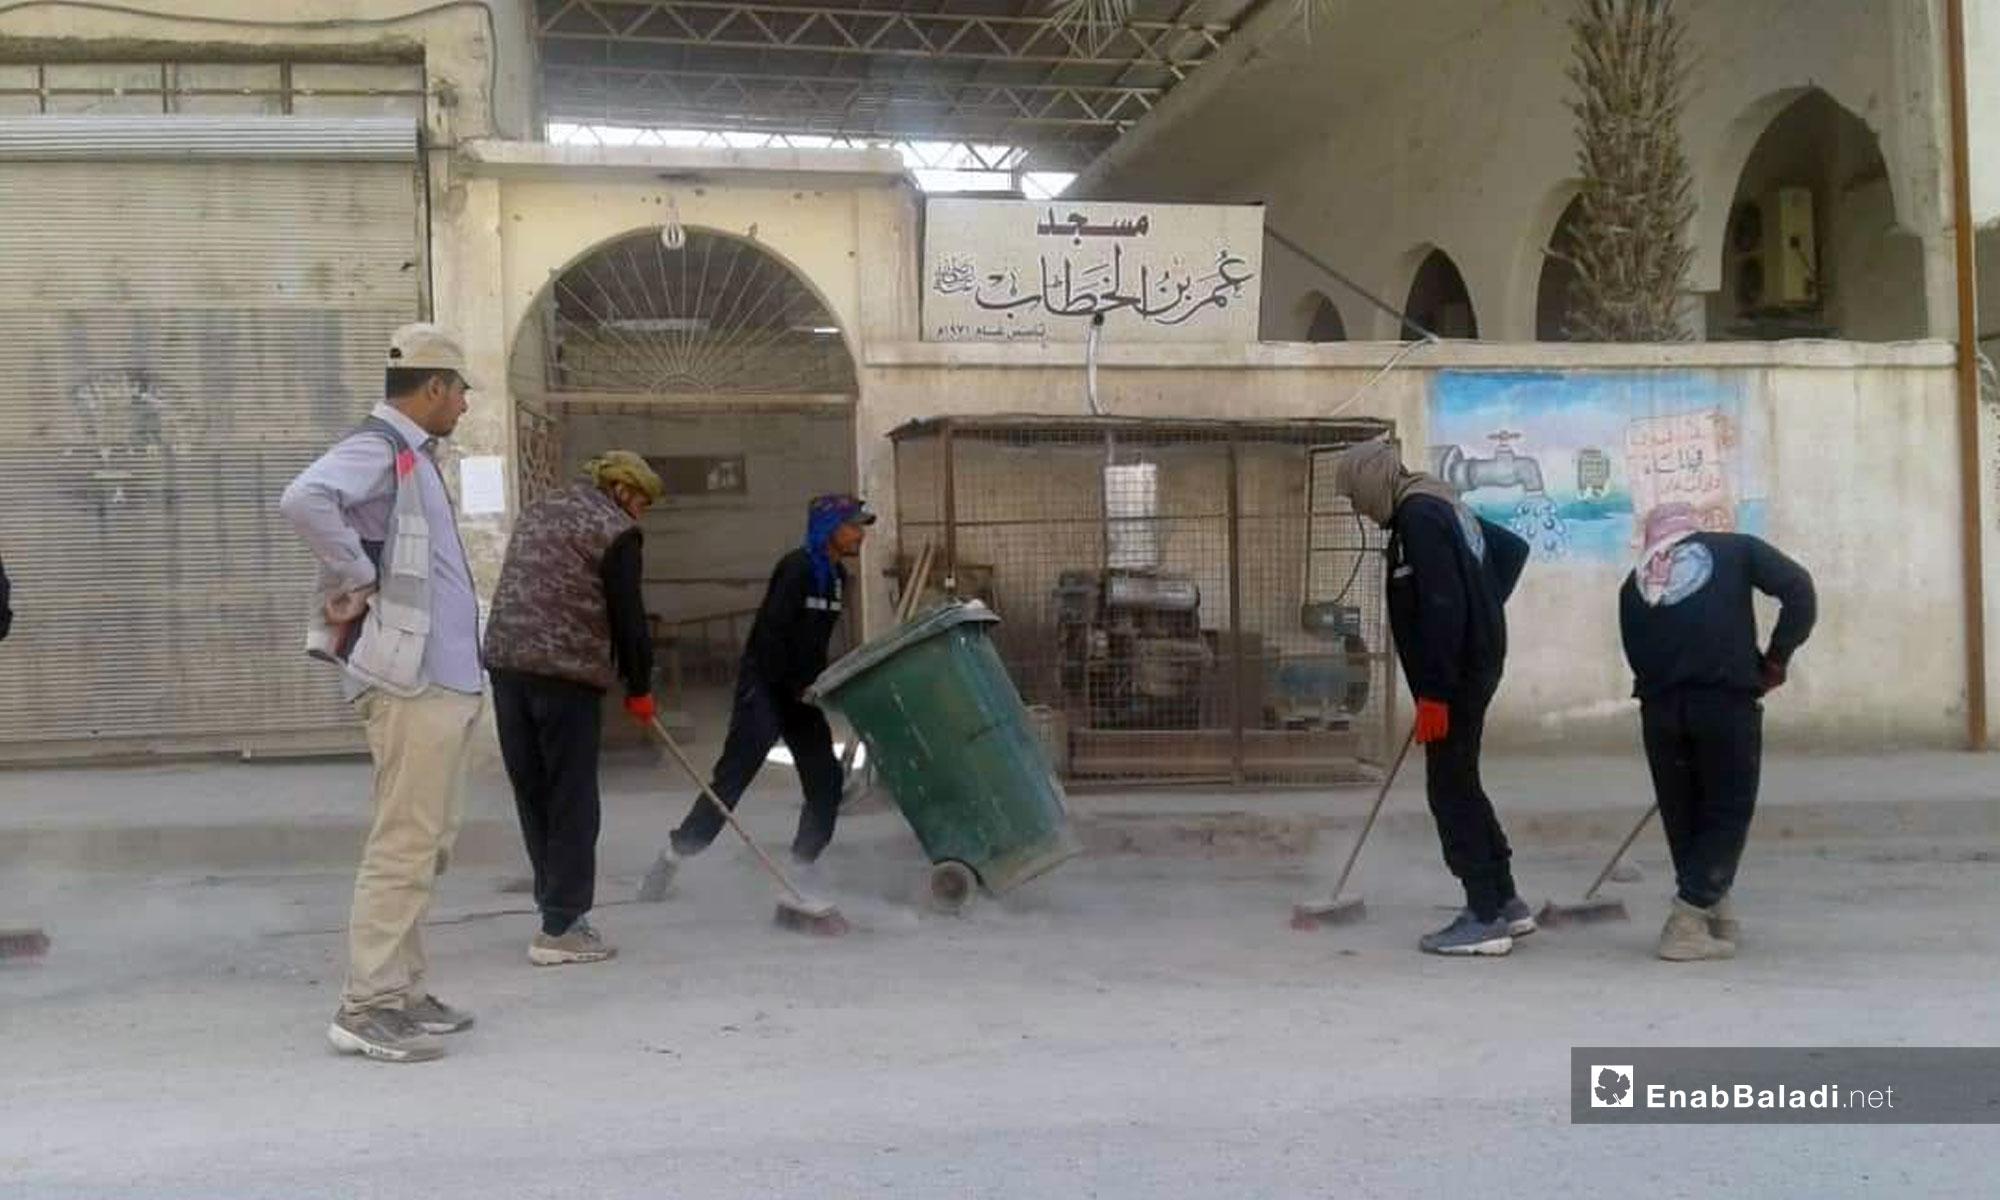 Cleaning Raqqa city's streets on the first days of Ramadan - May 8, 2019 (Enab Baladi)